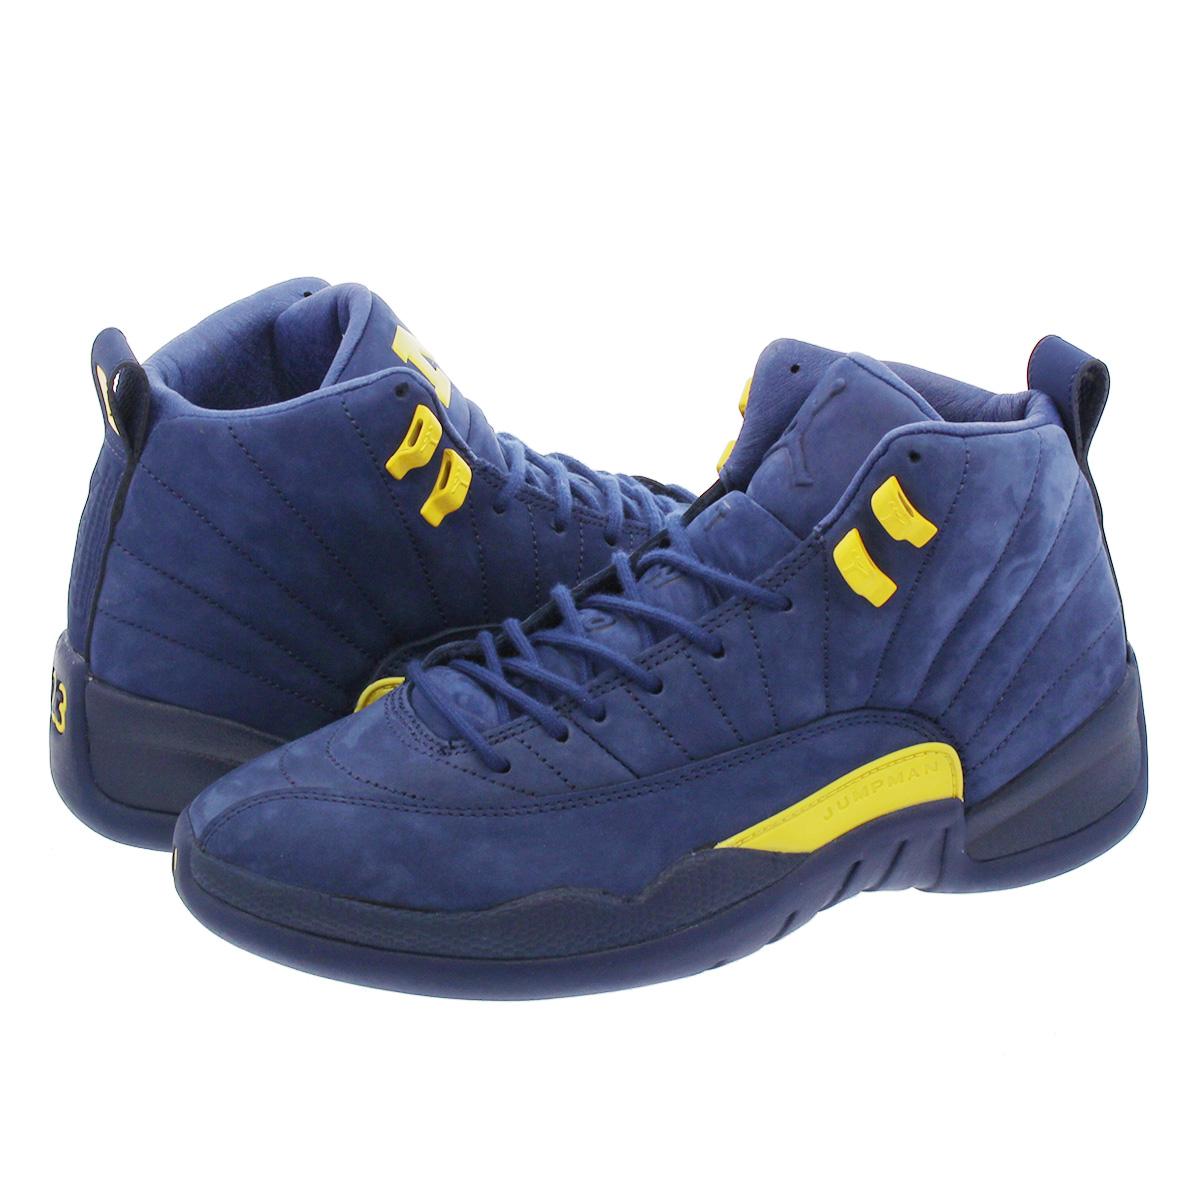 save off 1d230 6638f NIKE AIR JORDAN 12 RETRO Nike Air Jordan 12 nostalgic Michigan COLLEGE  NAVY/AMARILLO bq3180-407